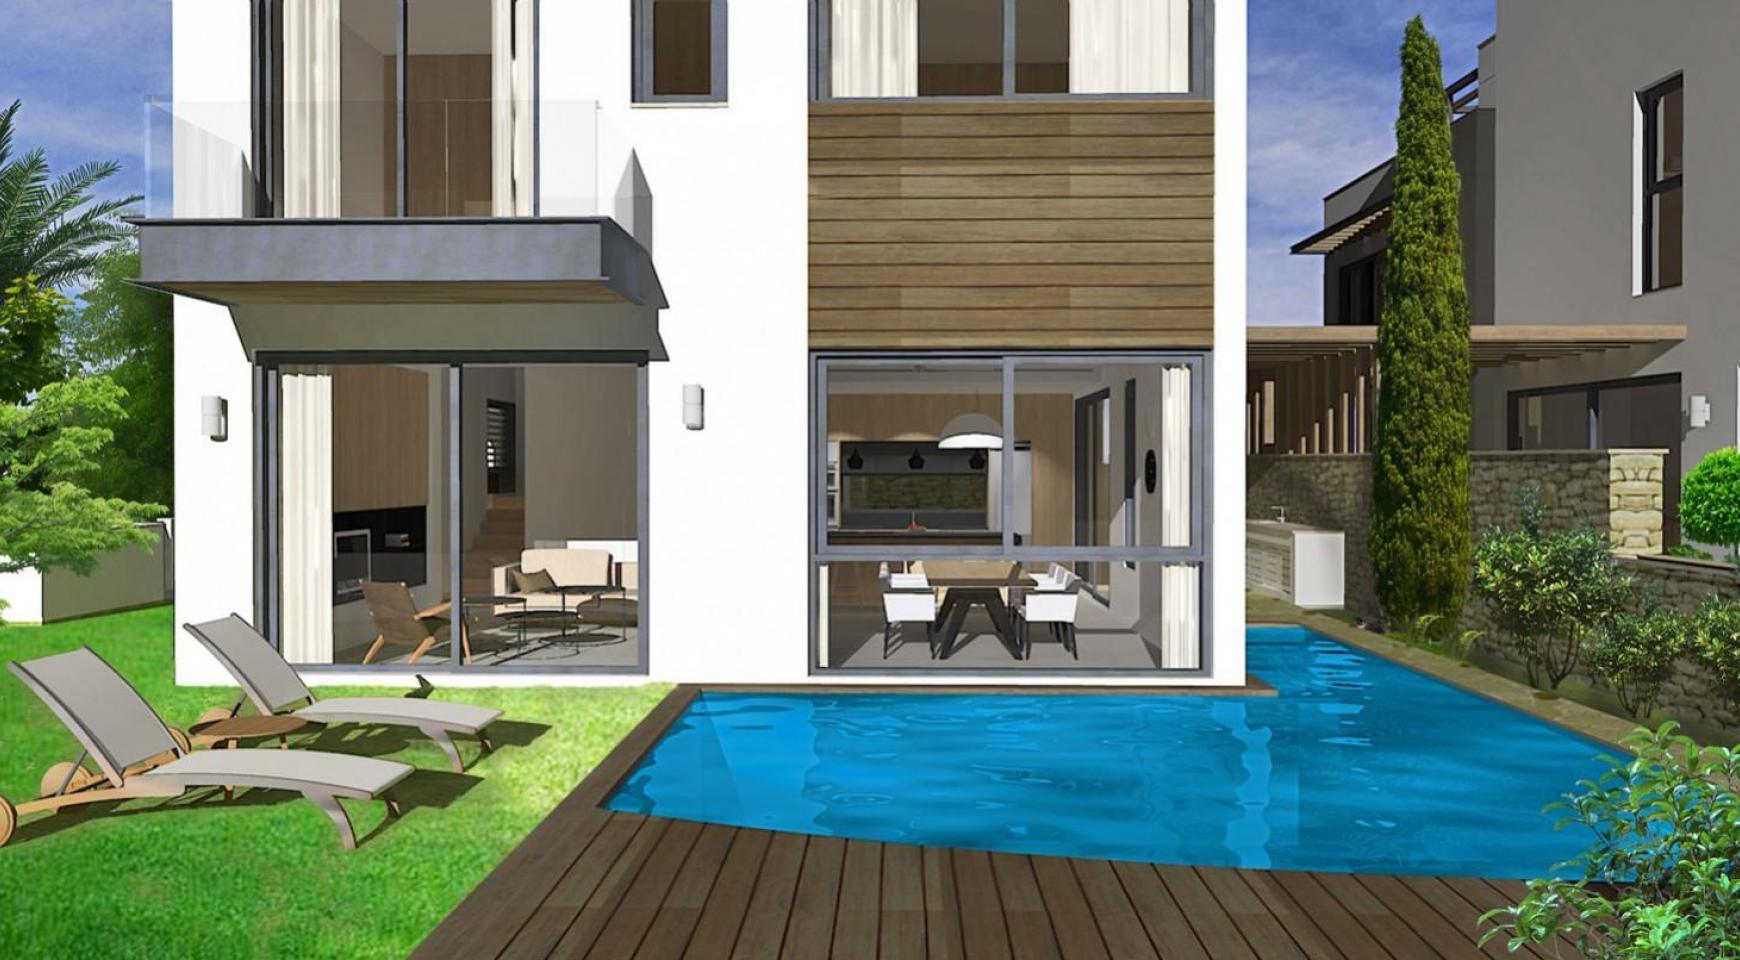 Spacious 4 Bedroom Villa in a New Complex in Agios Athanasios - 1